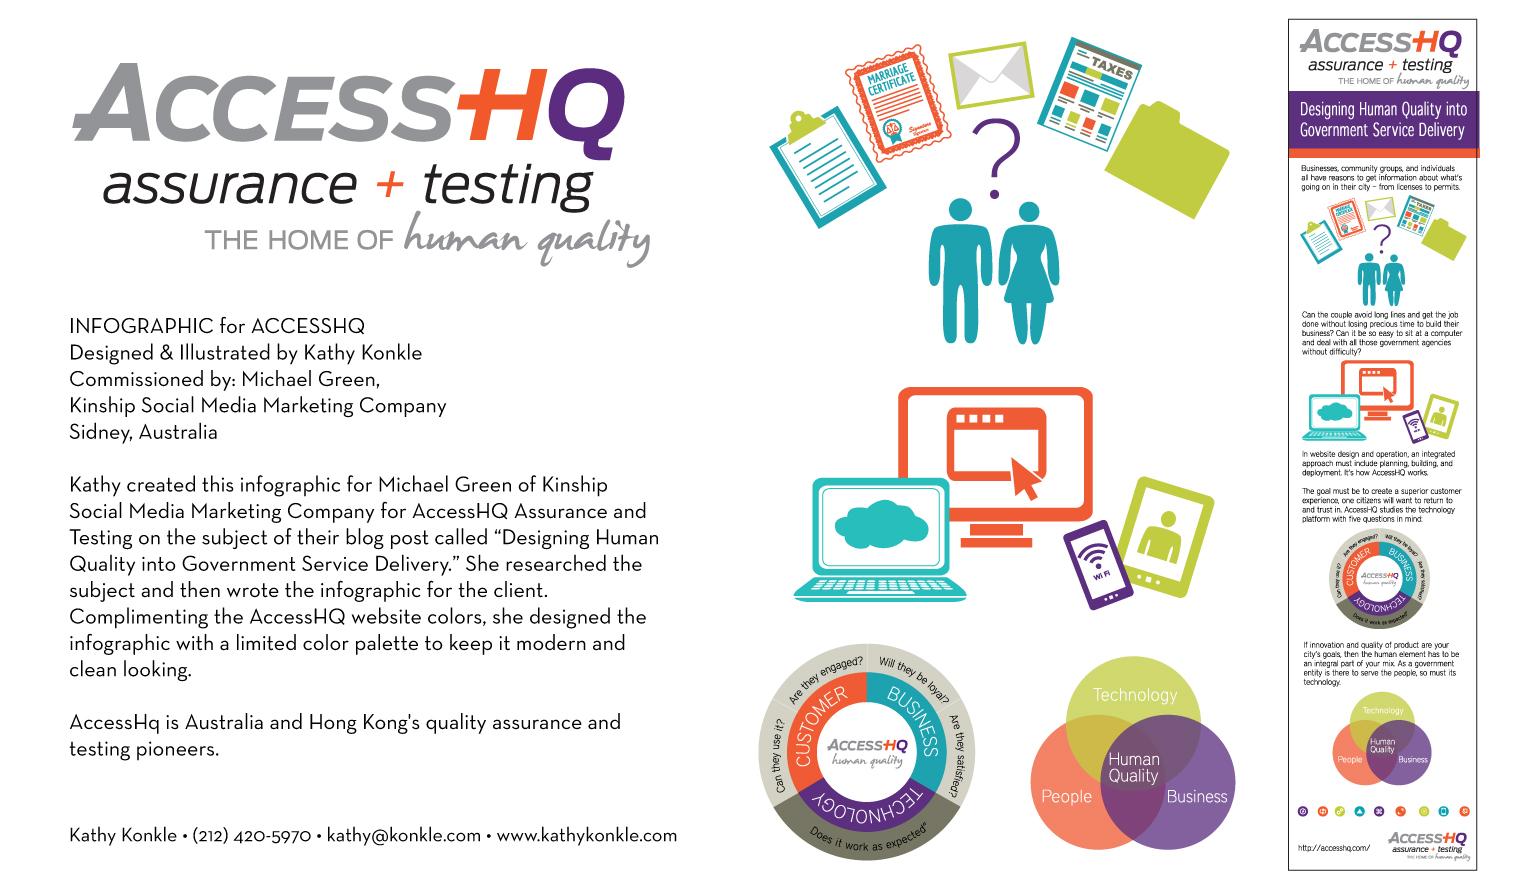 AccessHQ01-infographic.jpg